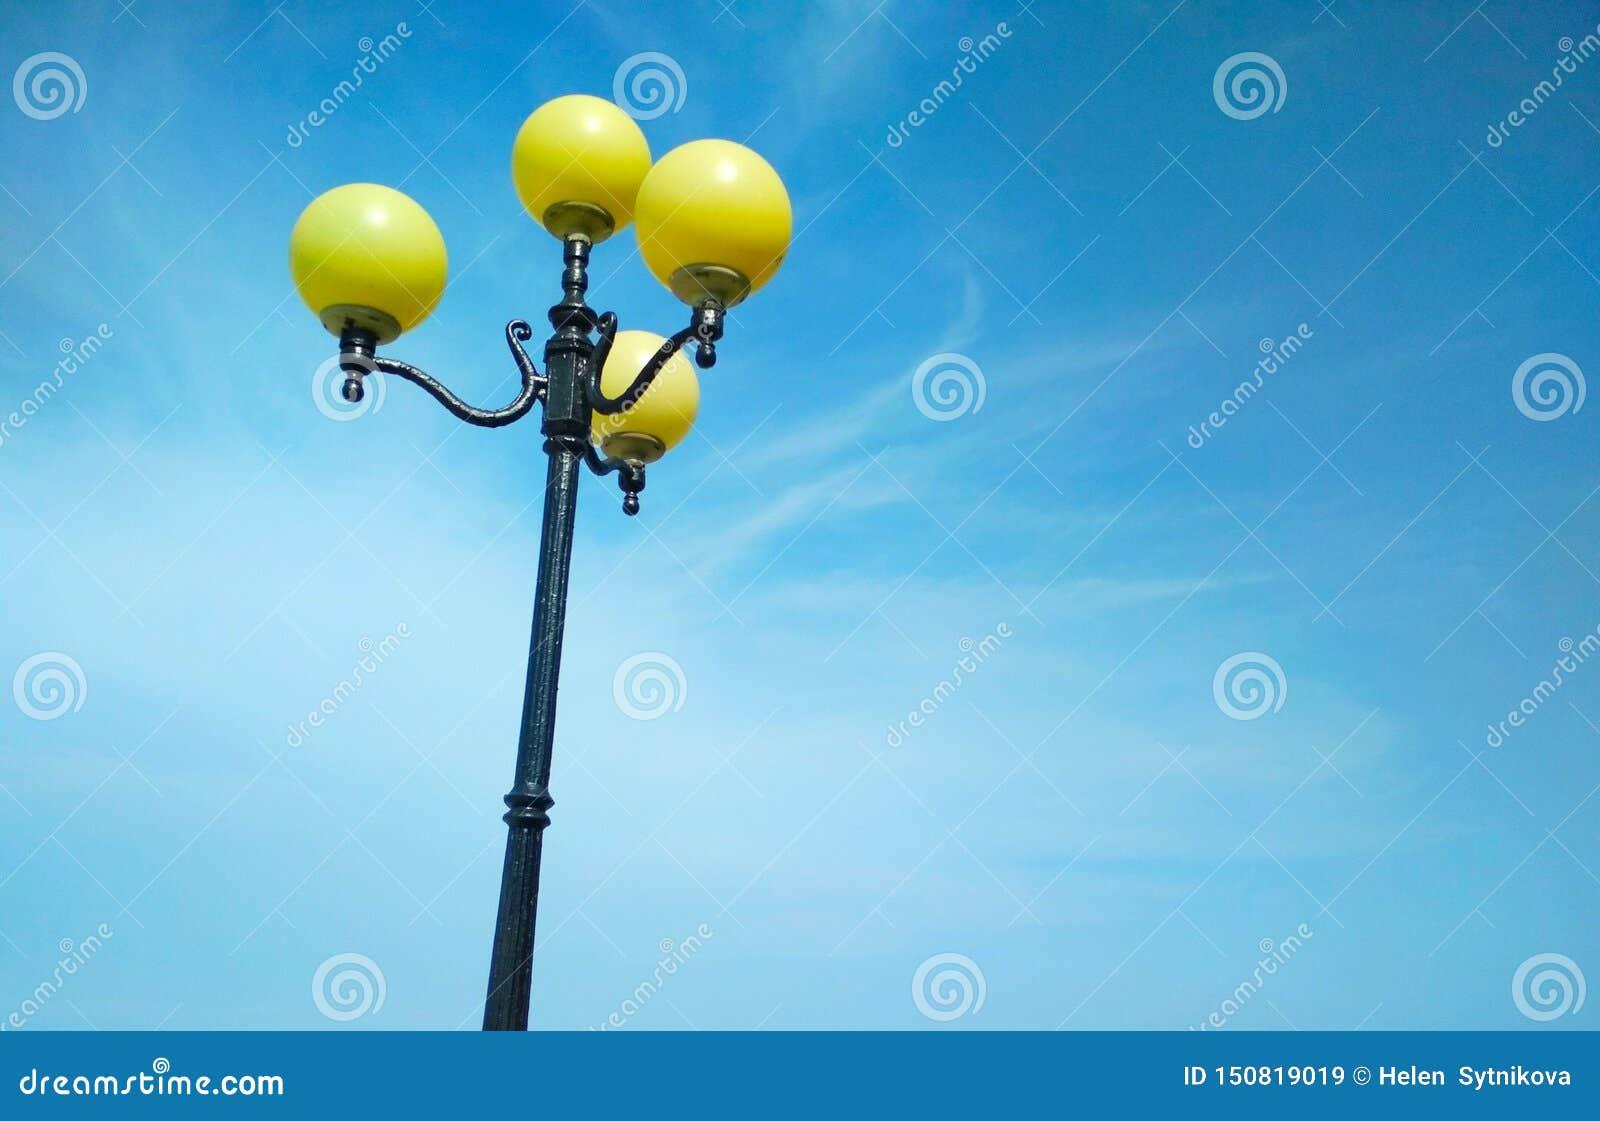 Street light, architectural decision